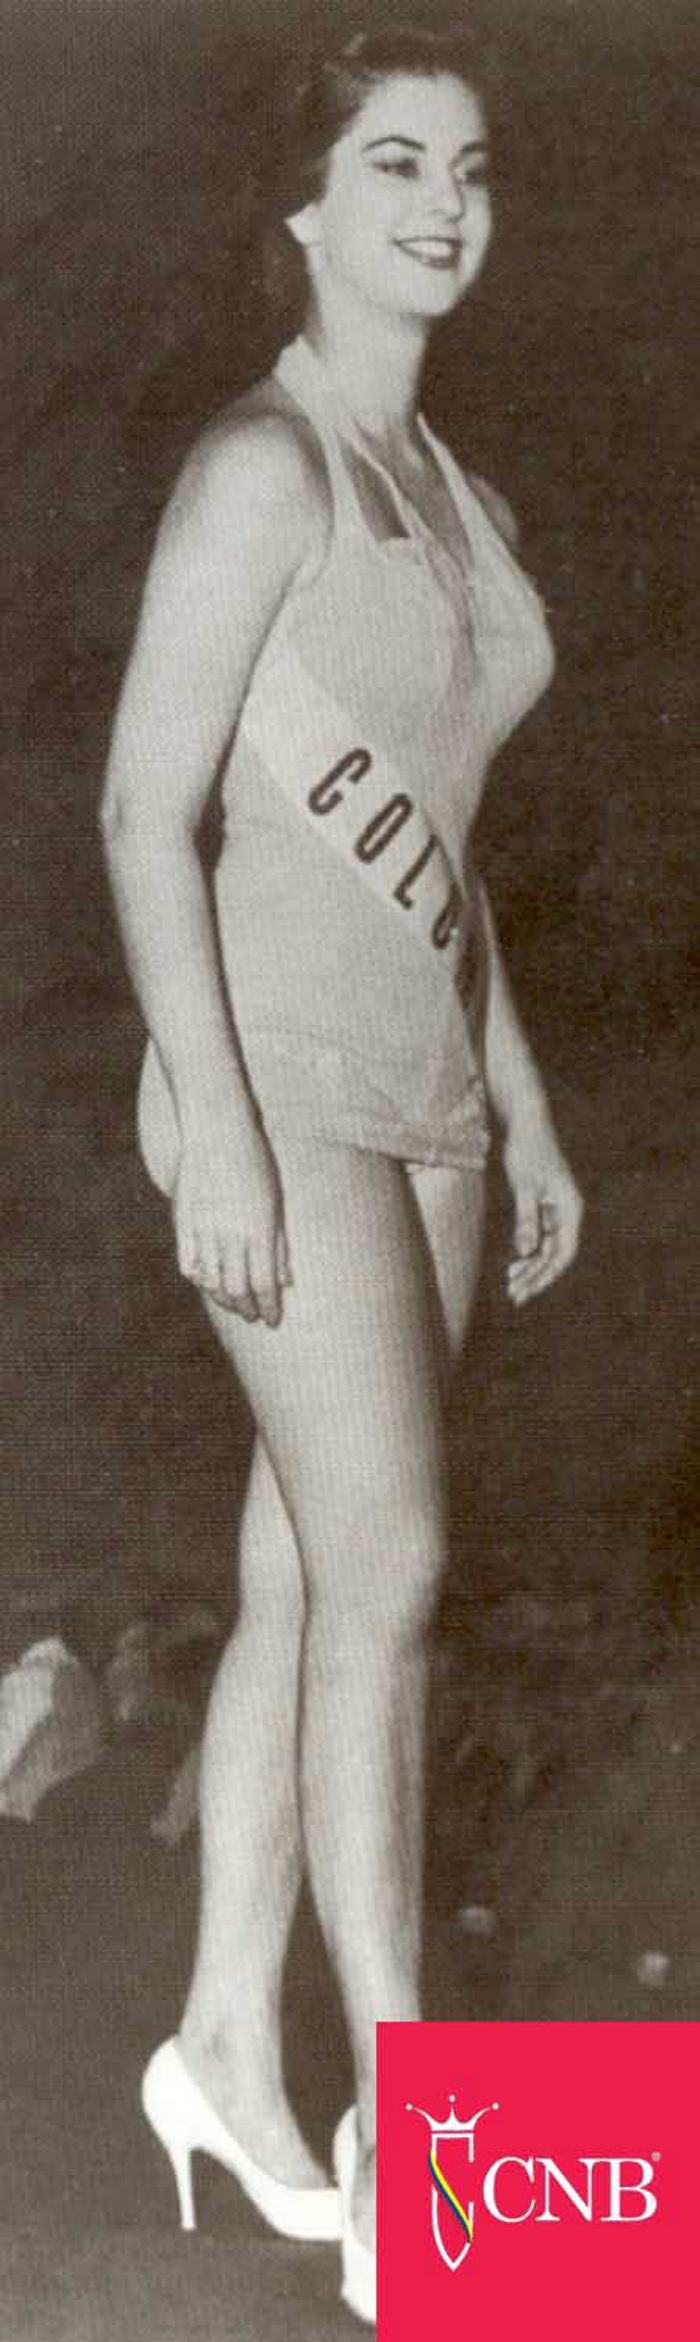 luz marina zuluaga, miss universe 1958. † - Página 4 Luz_ma24